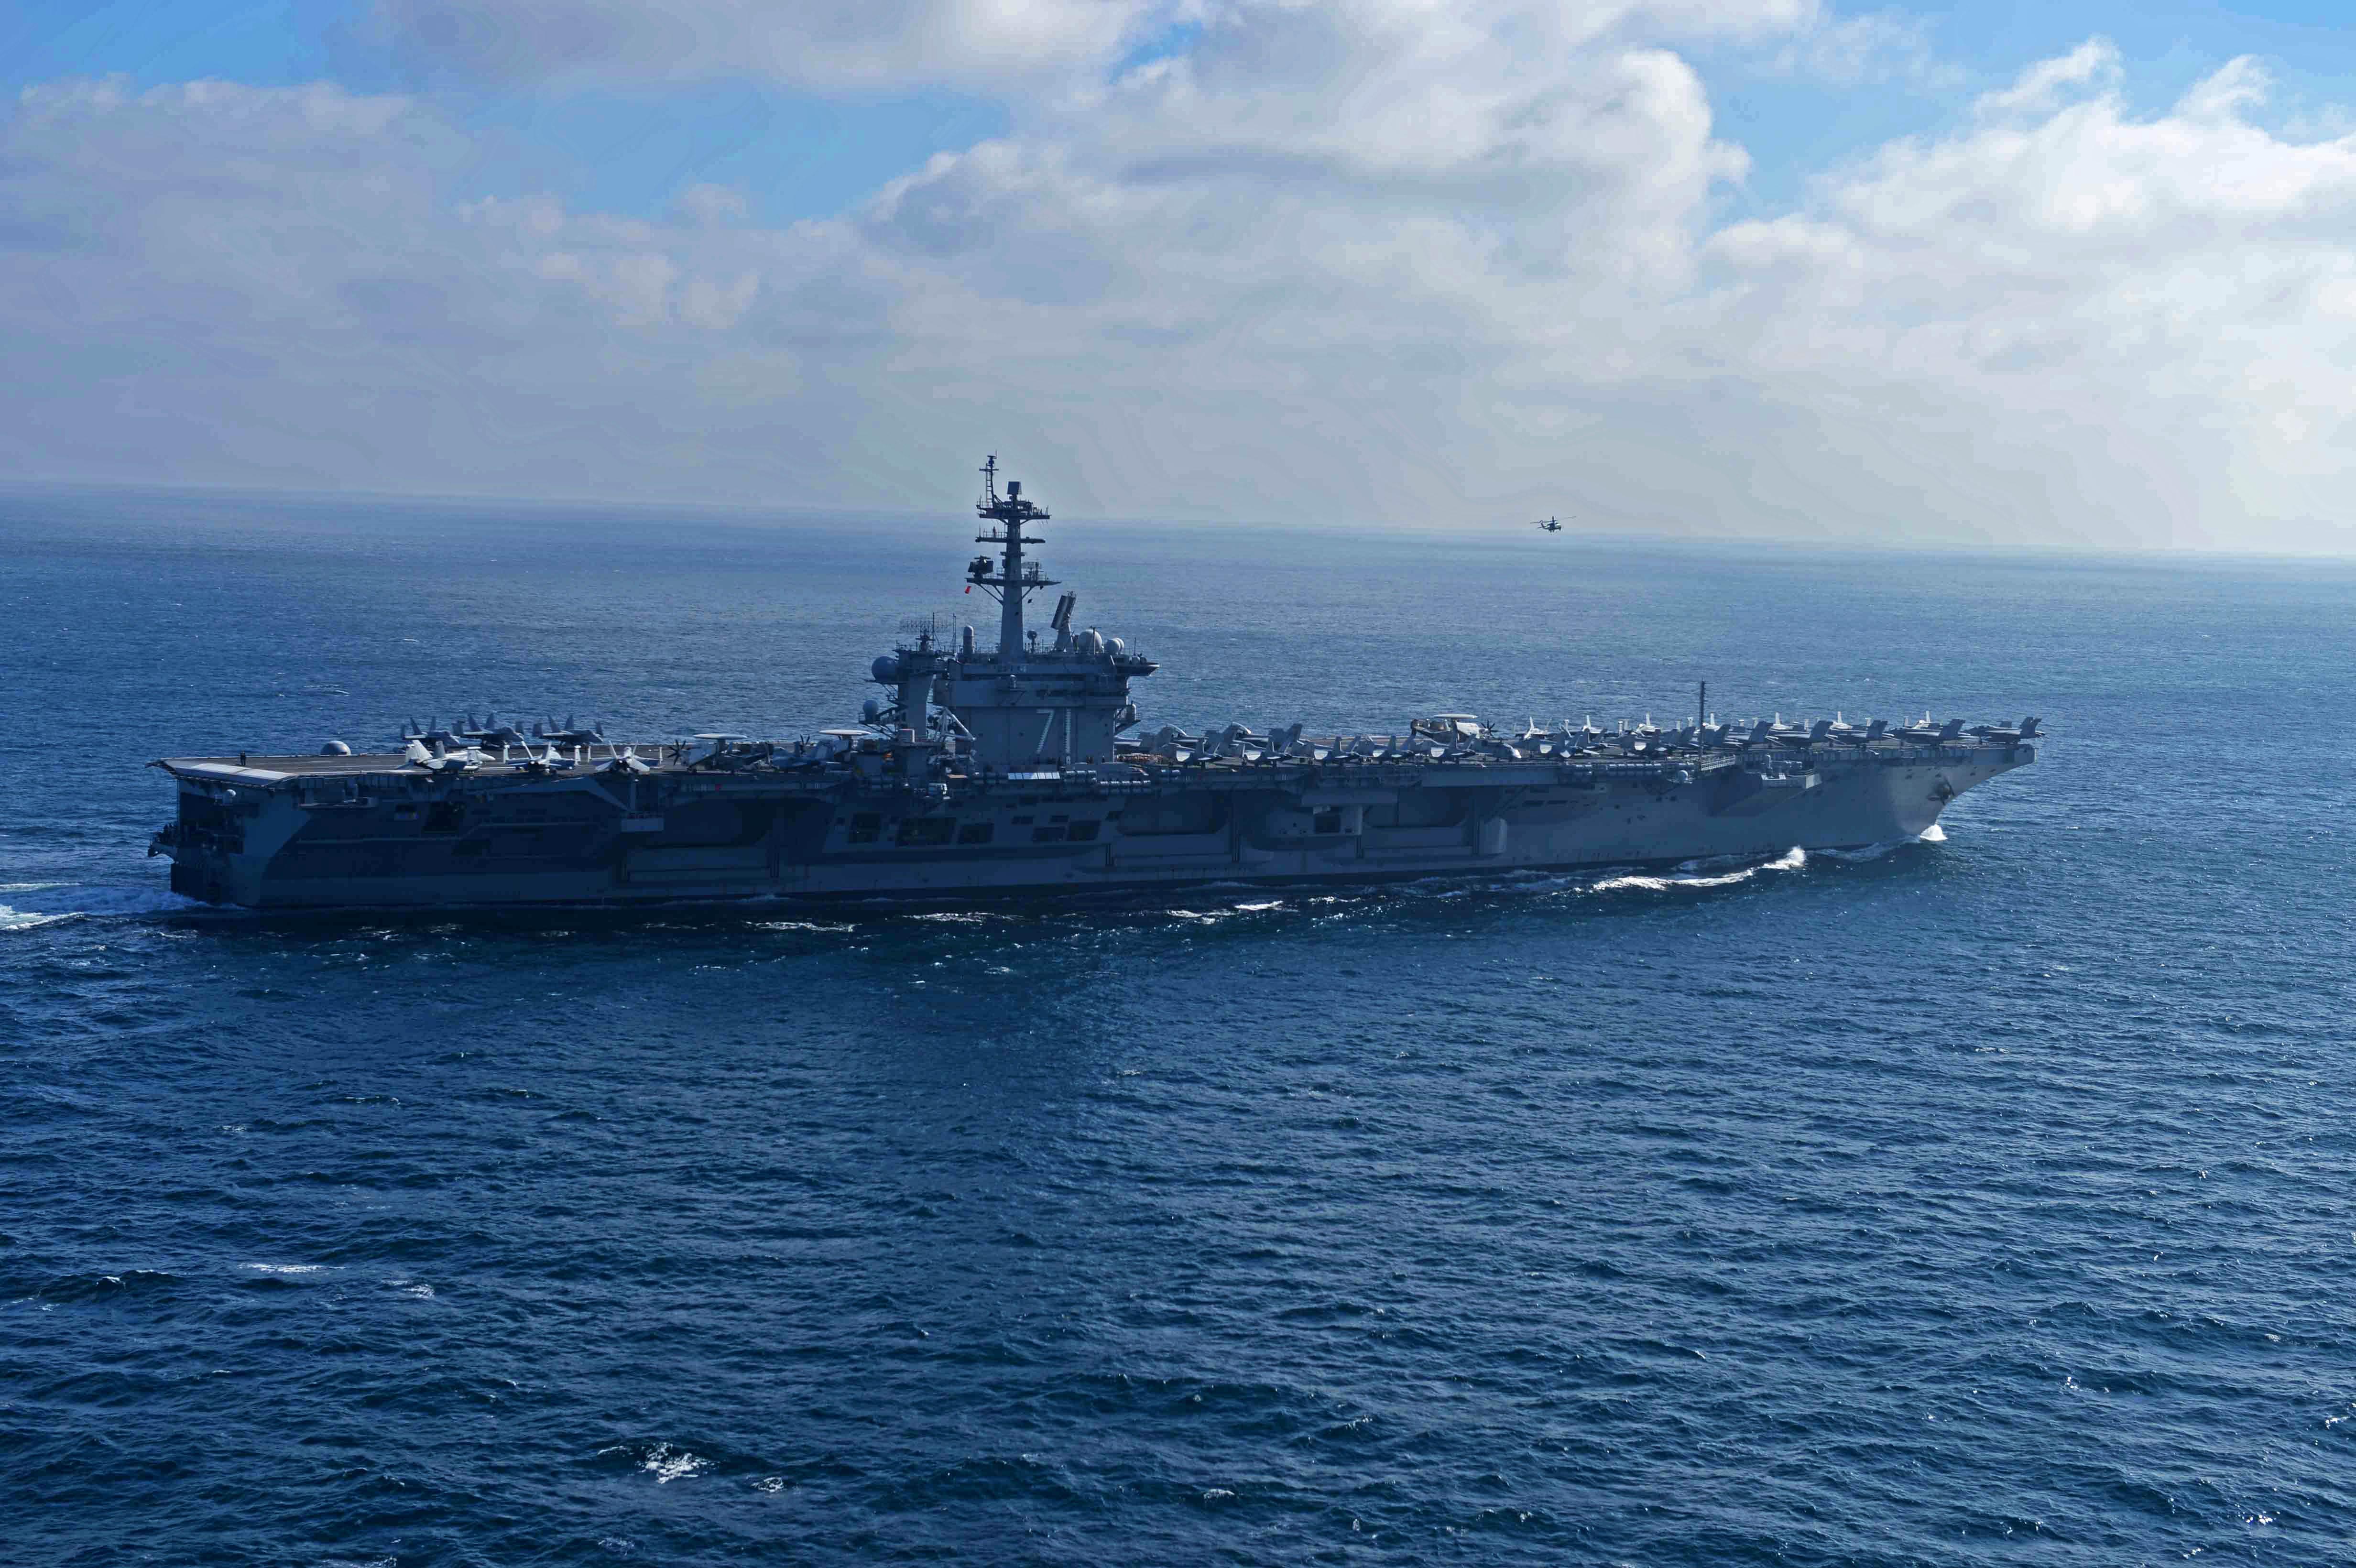 USS THEODORE ROOSEVELT CVN-71 am 16.01.2015 im Atlantik Bild: U.S. Navy